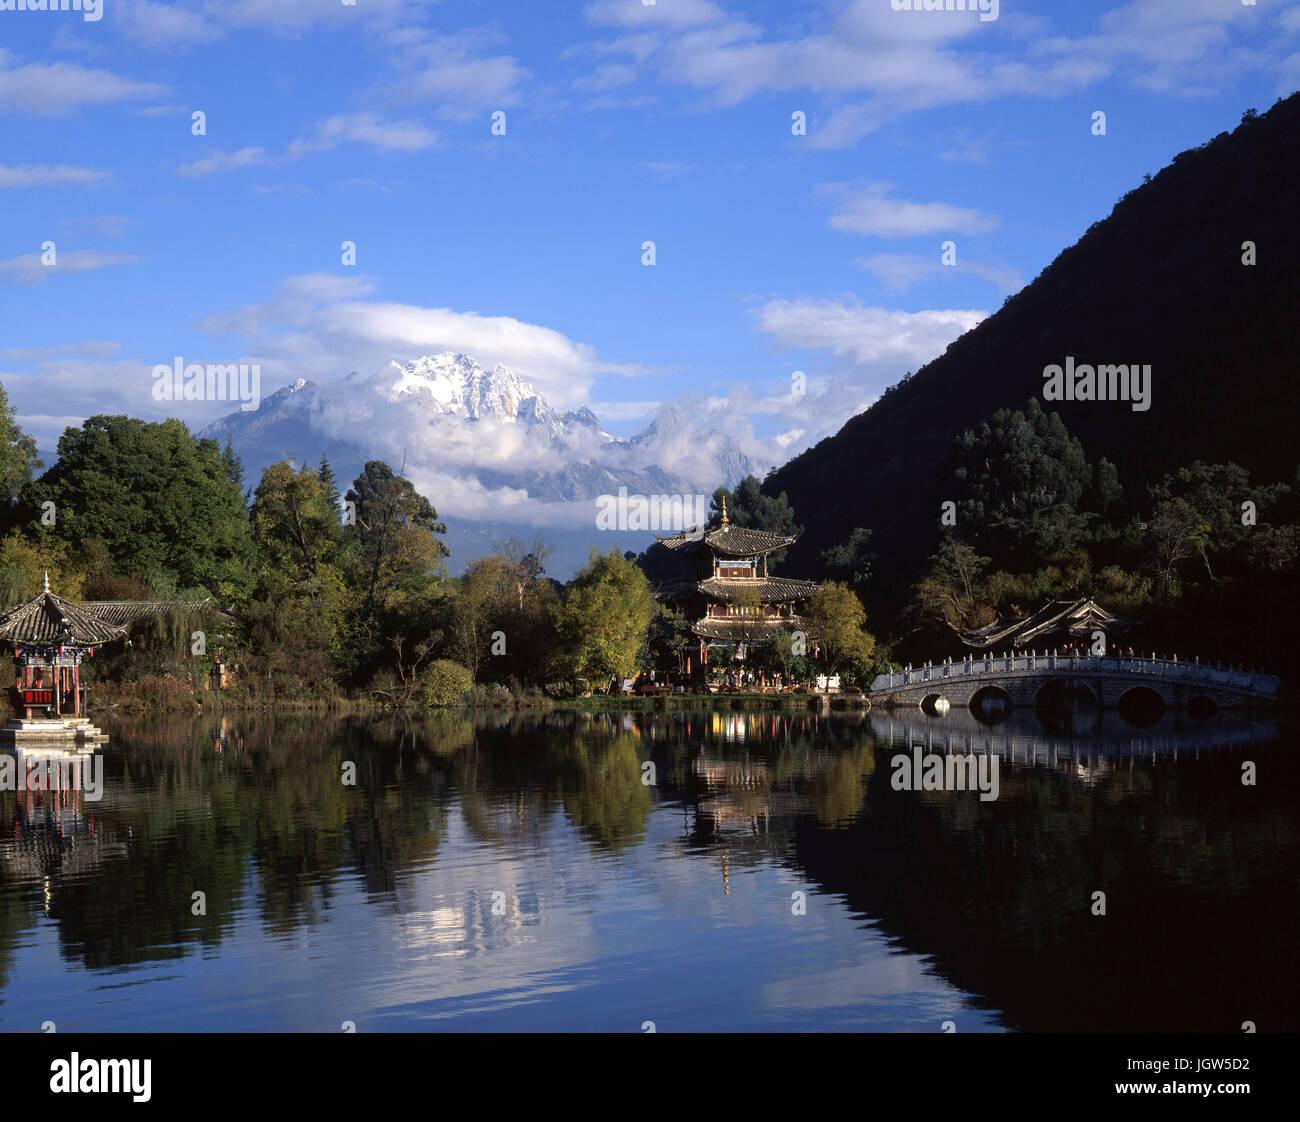 Black Dragon Pool park looking towards Jade Dragon Snow Mountain in Lijiang, China Stock Photo